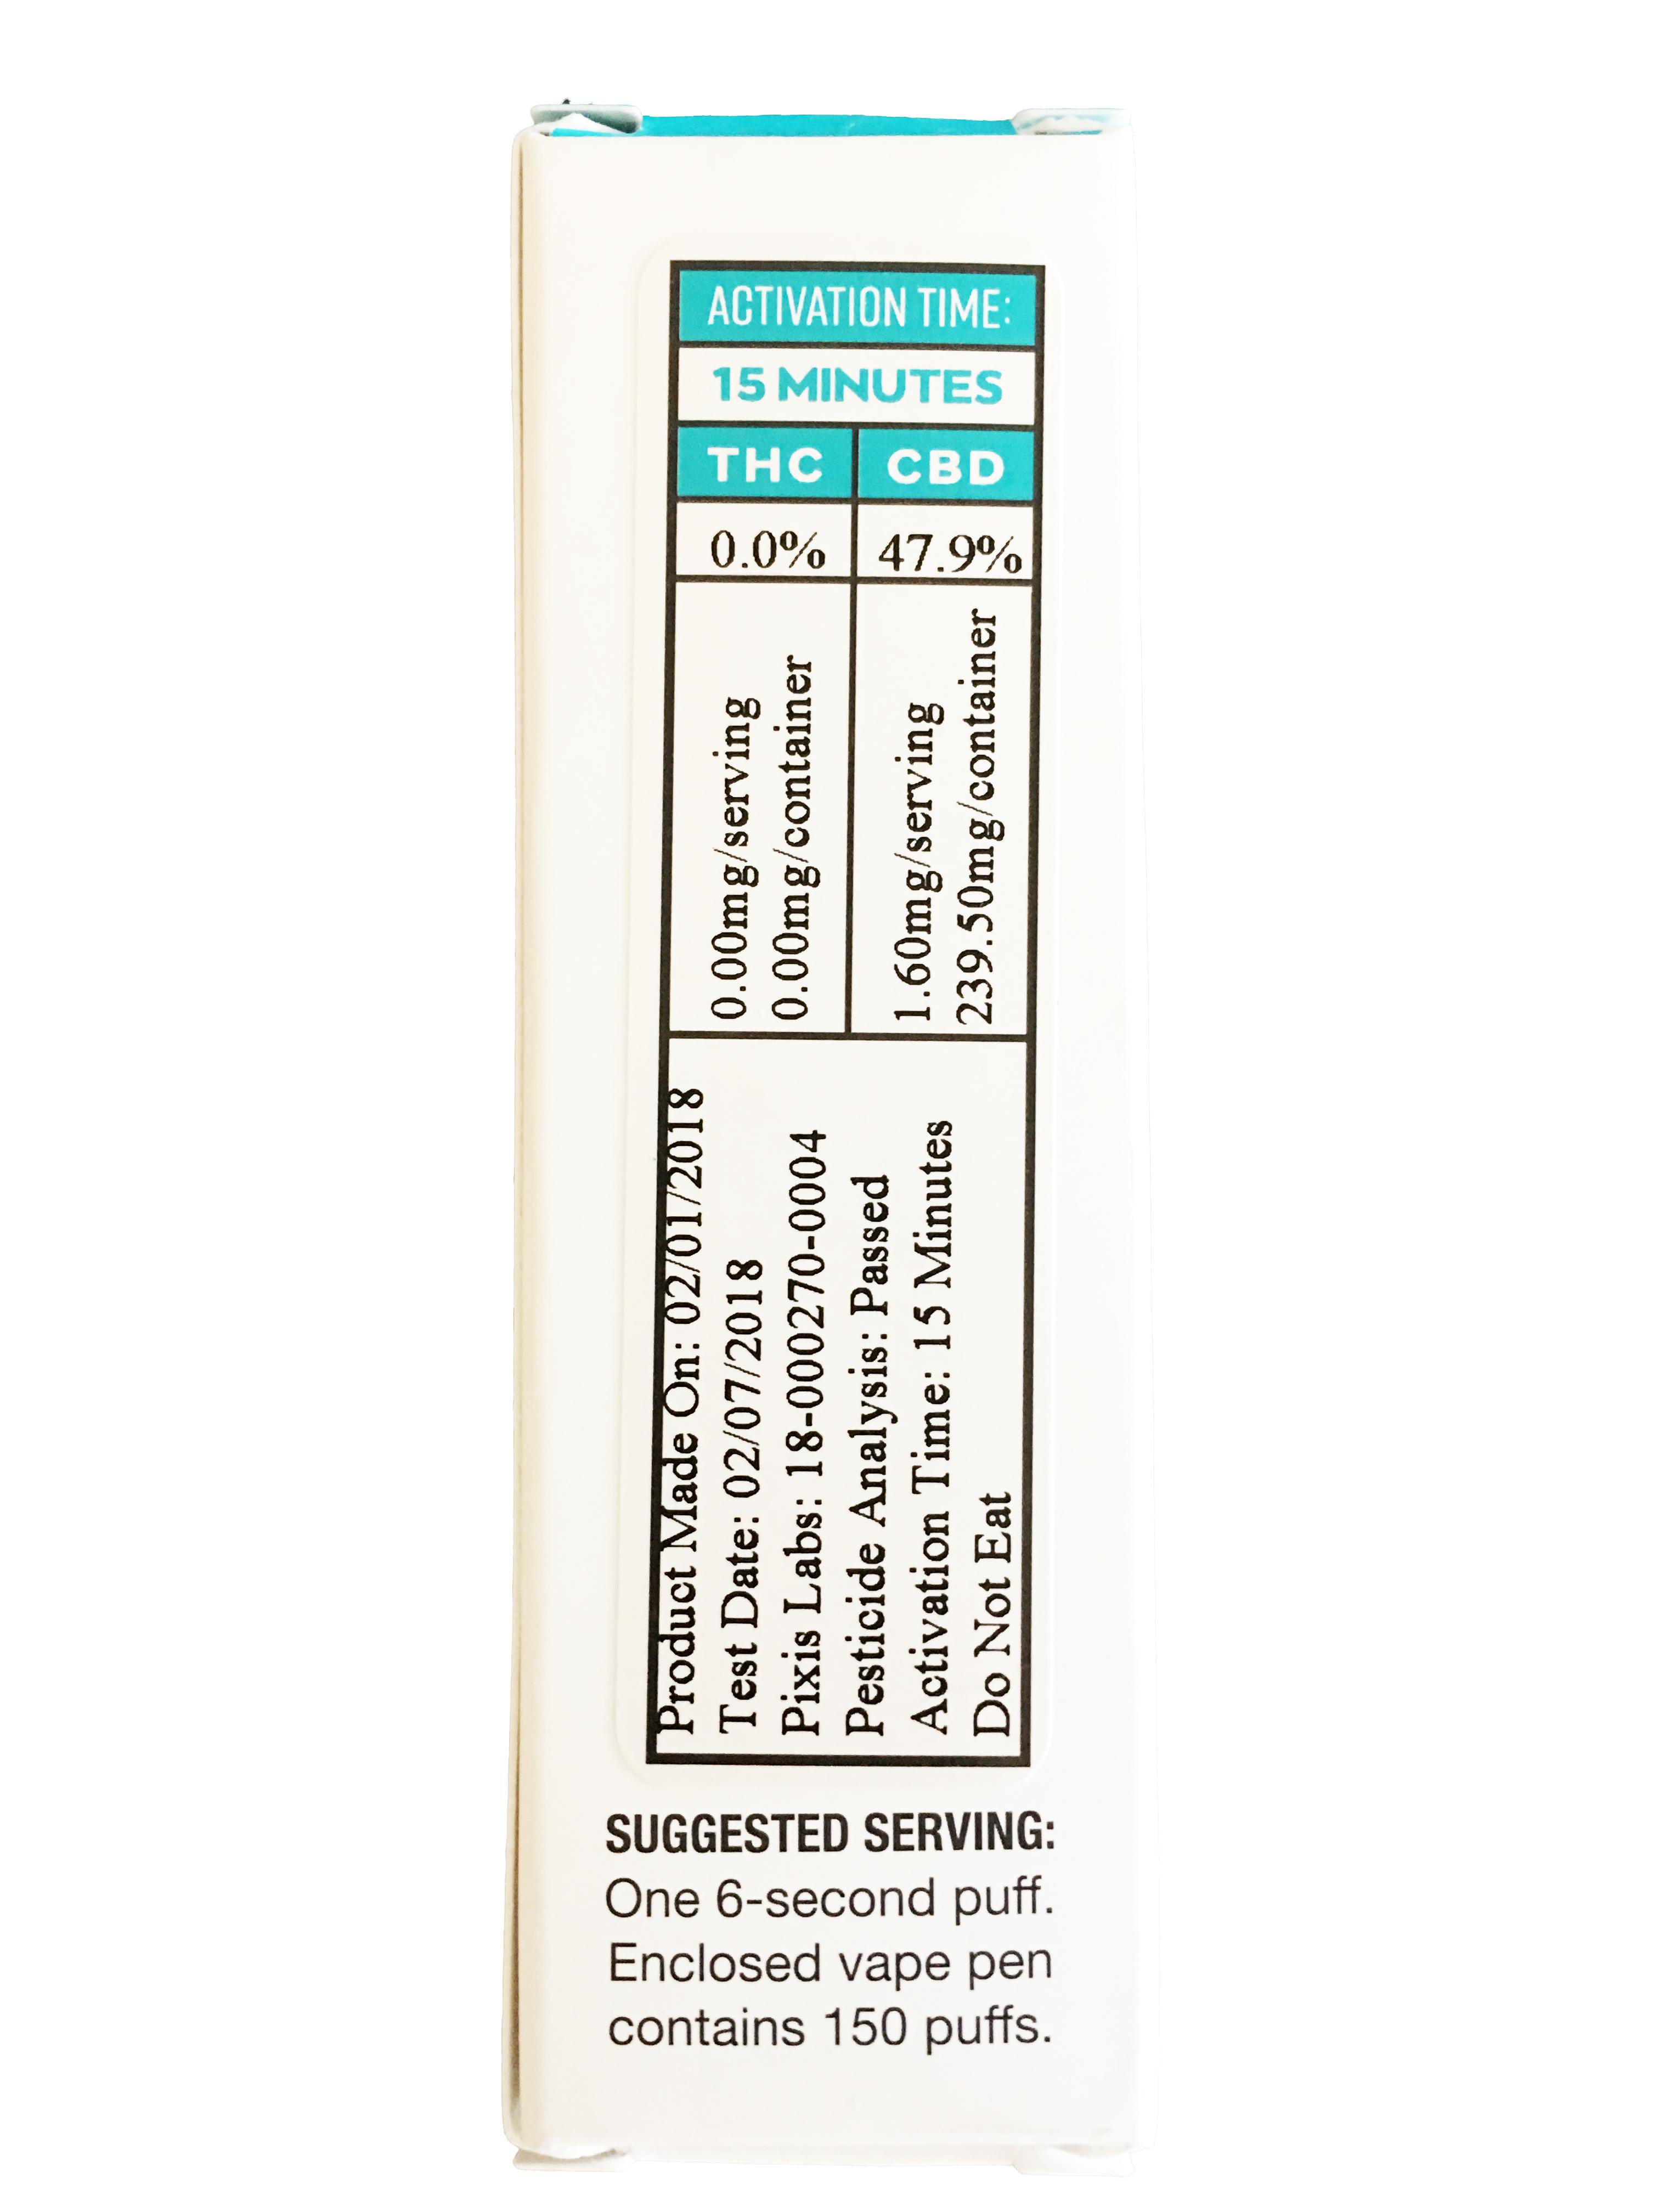 Select 240mg Disposable Vape Pen - RELAX Lavender | naturalearthcbd